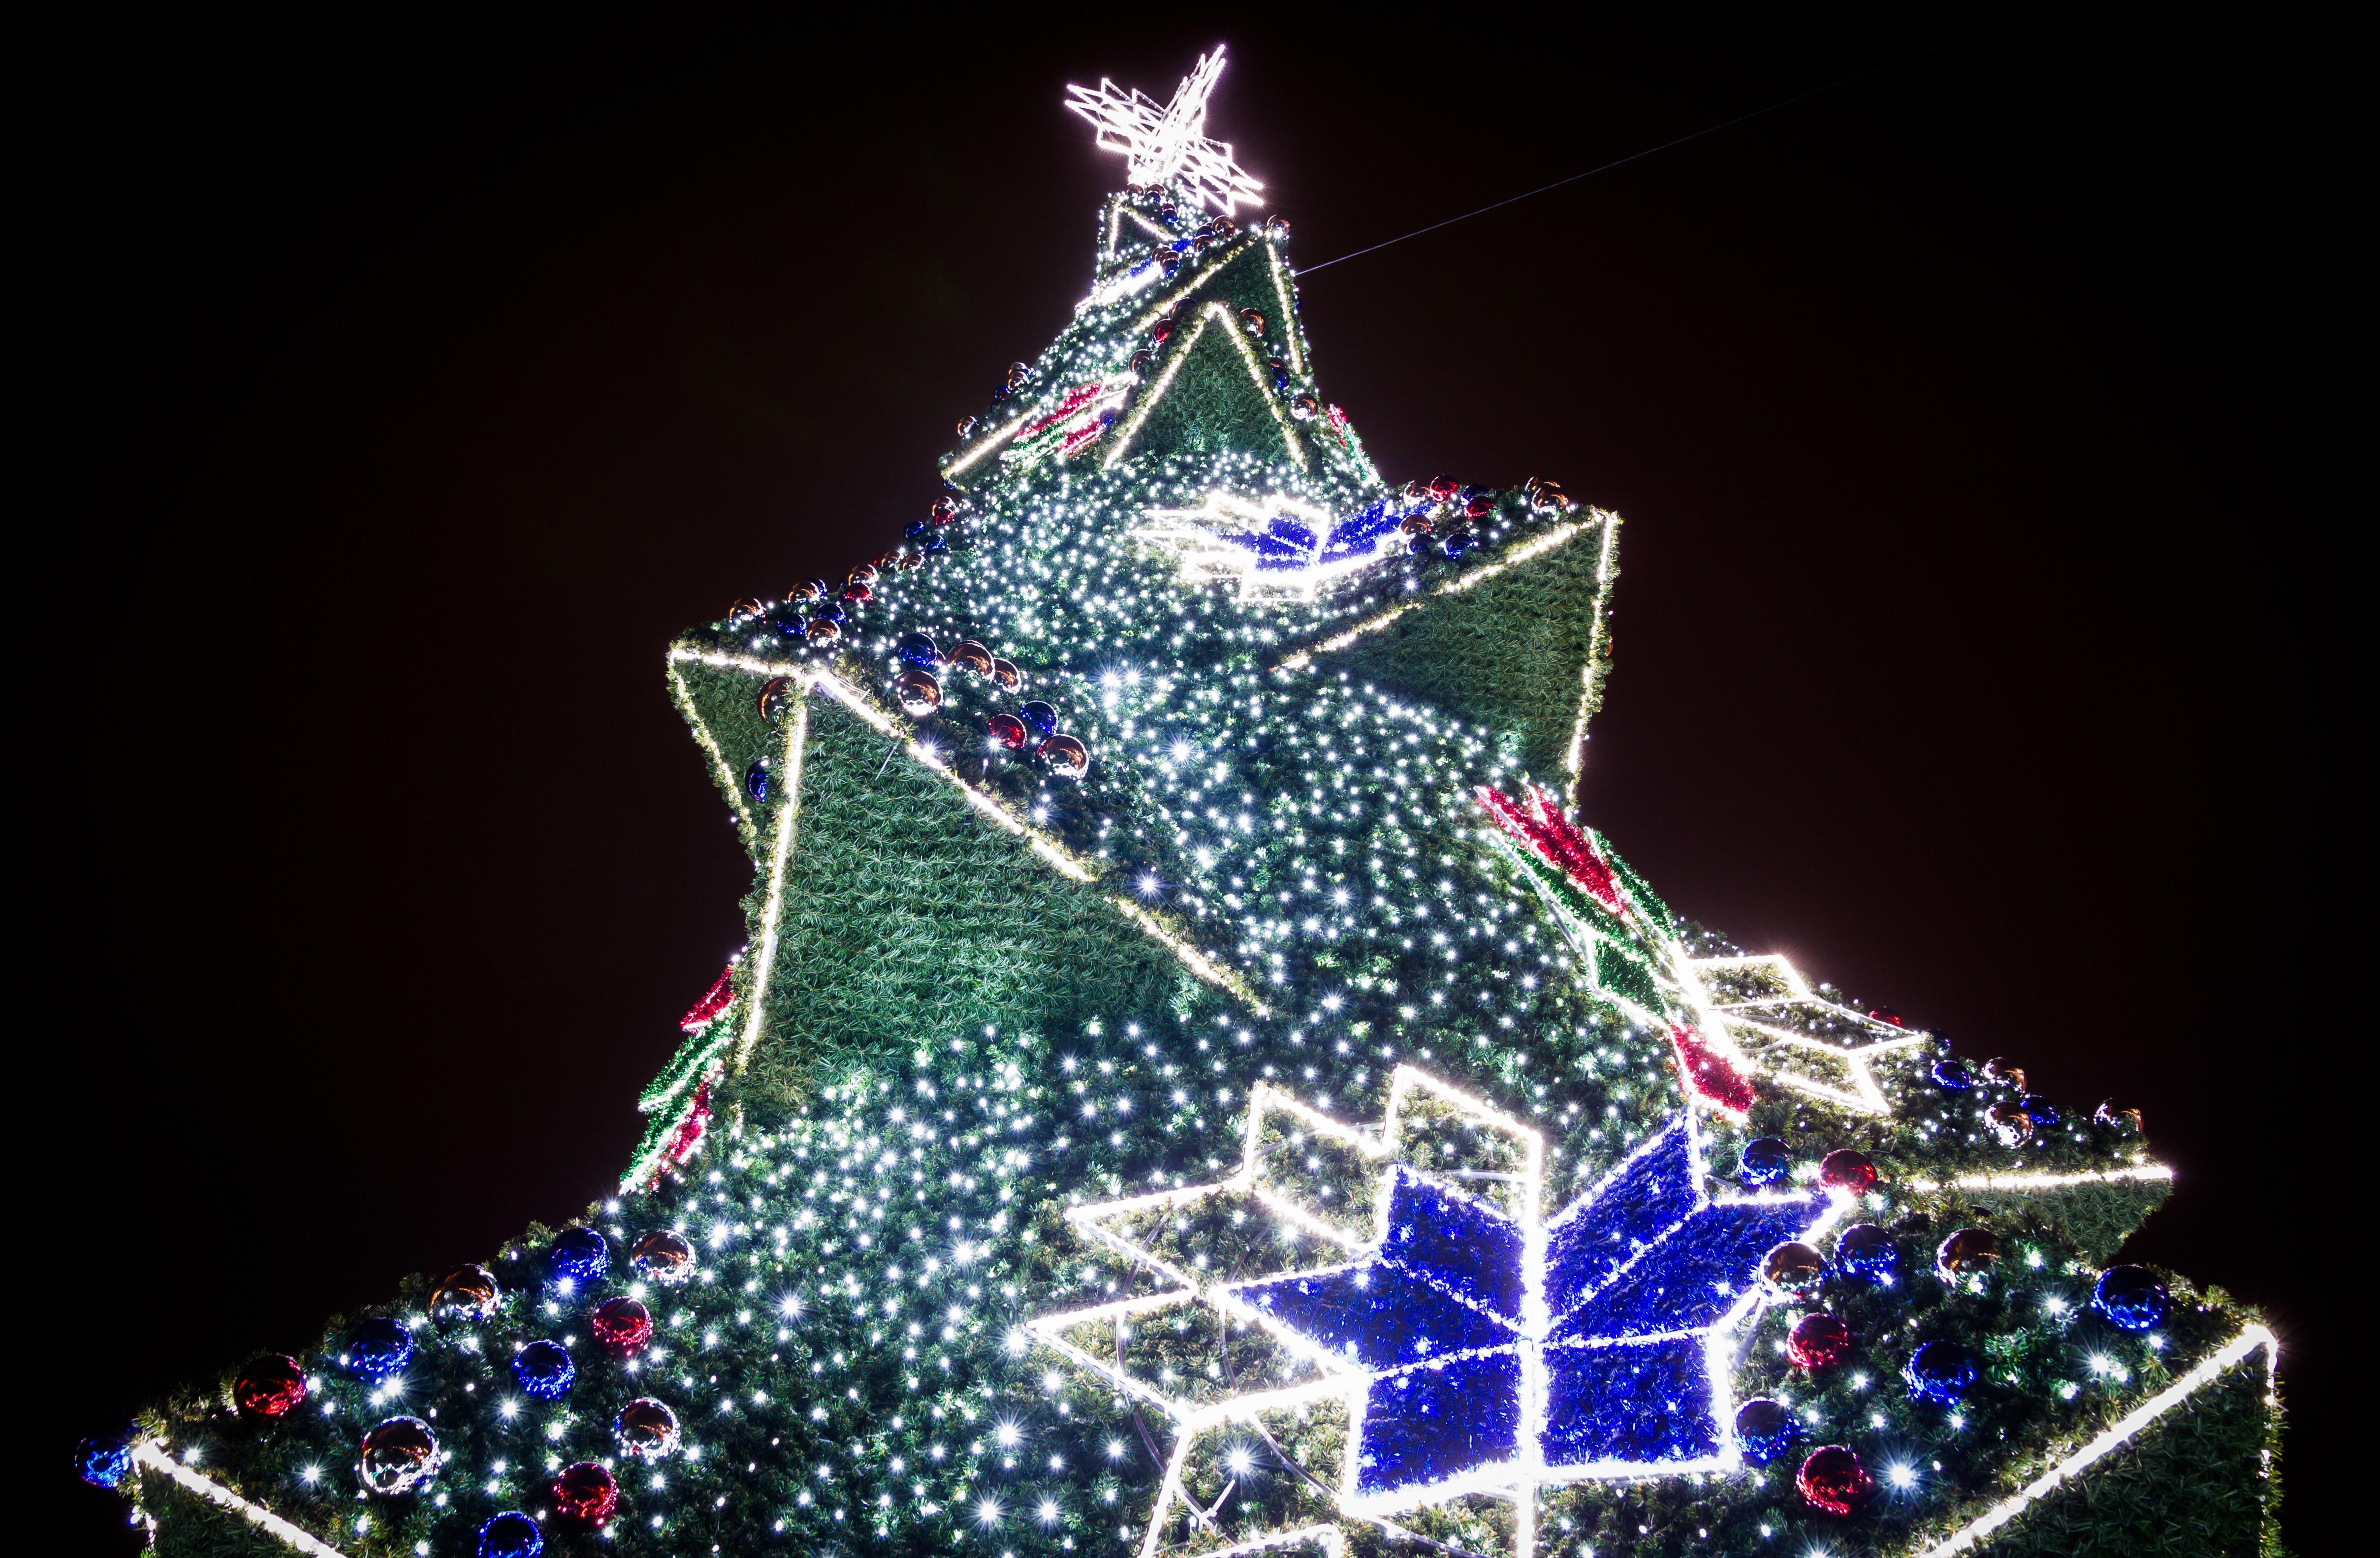 Krakow Main Market Christmas Tree, Poland, Black background, Night, Trees, Travel, HQ Photo